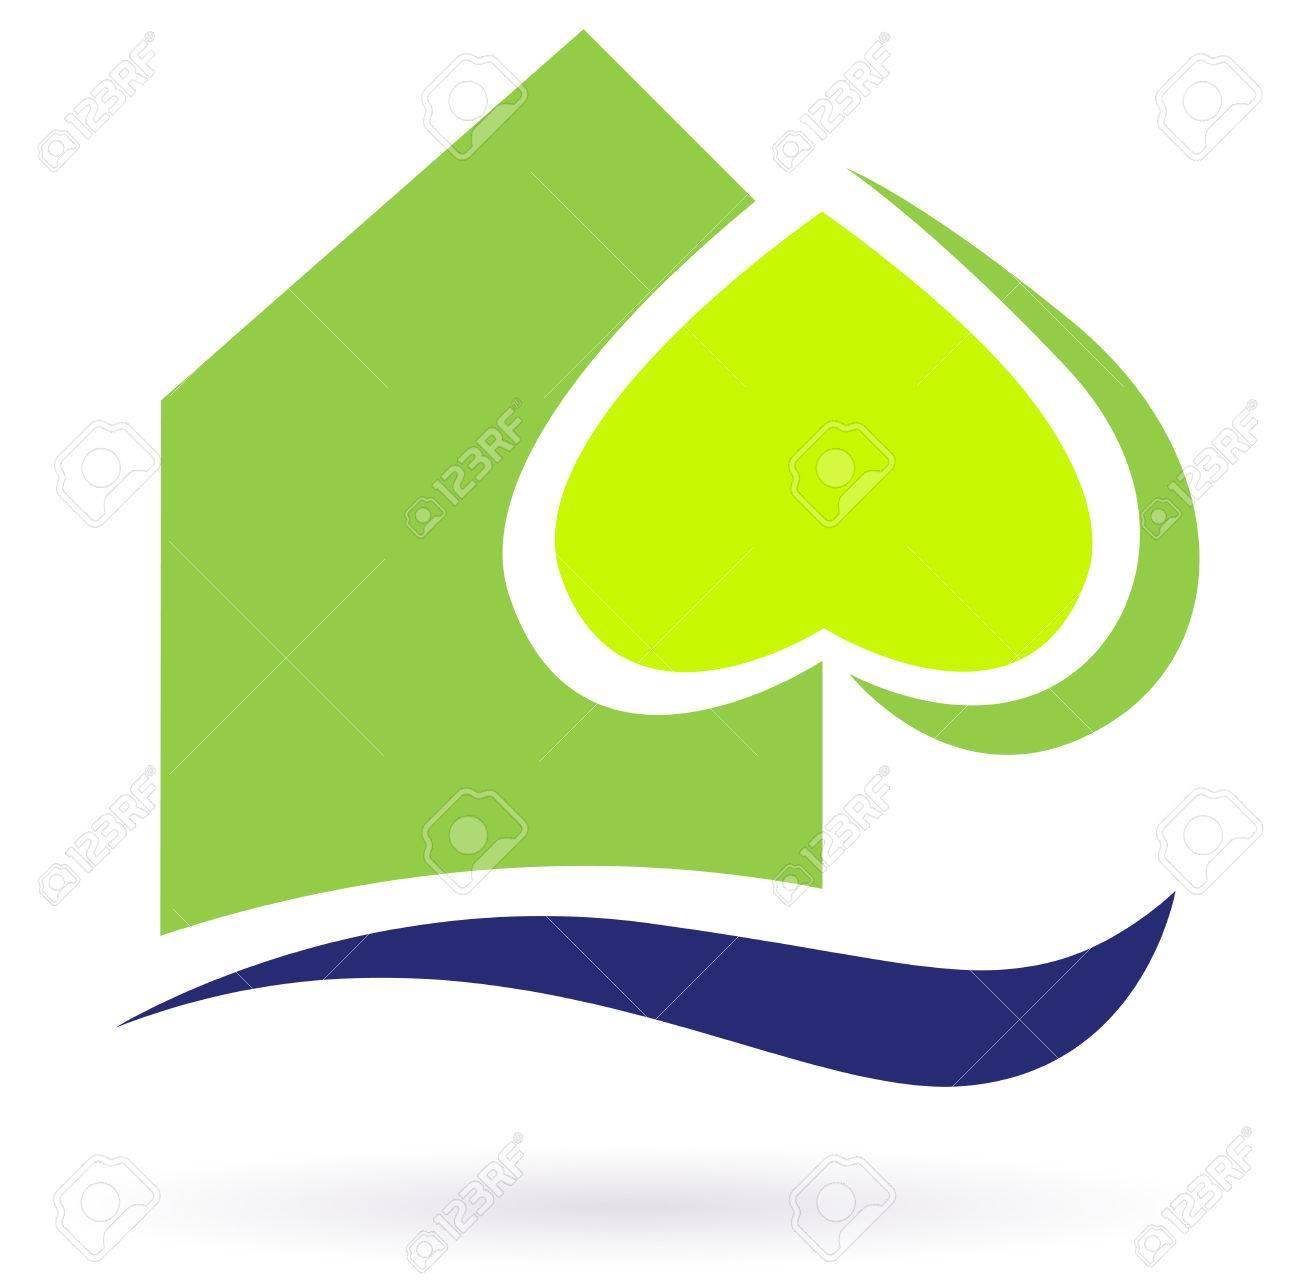 Green nature eco house icon. Green eco house icon. illustration. - 8098071